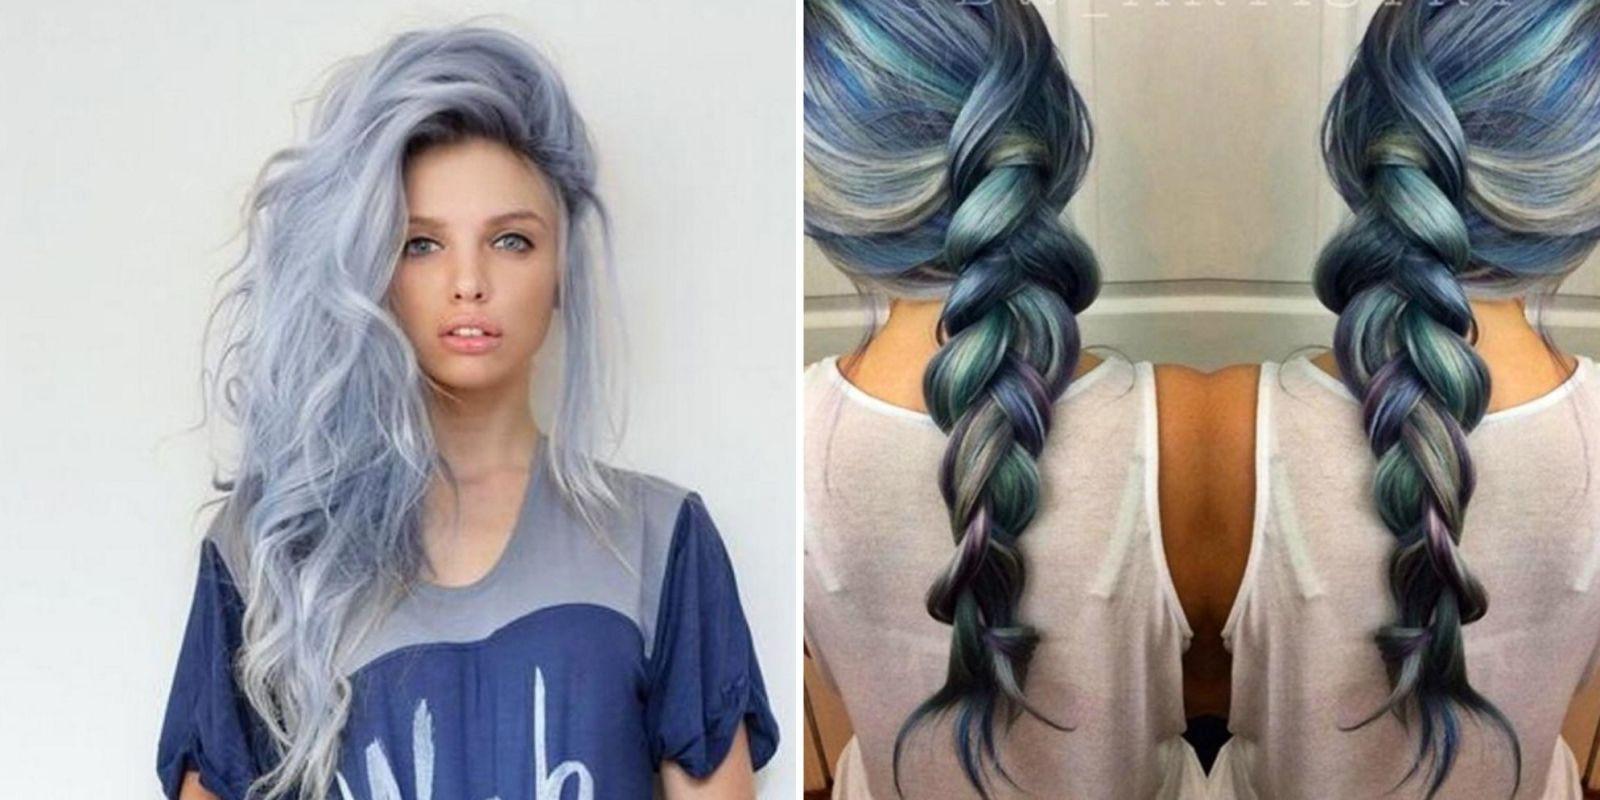 Denim Hair The New Hot Hair Trend Directexpose